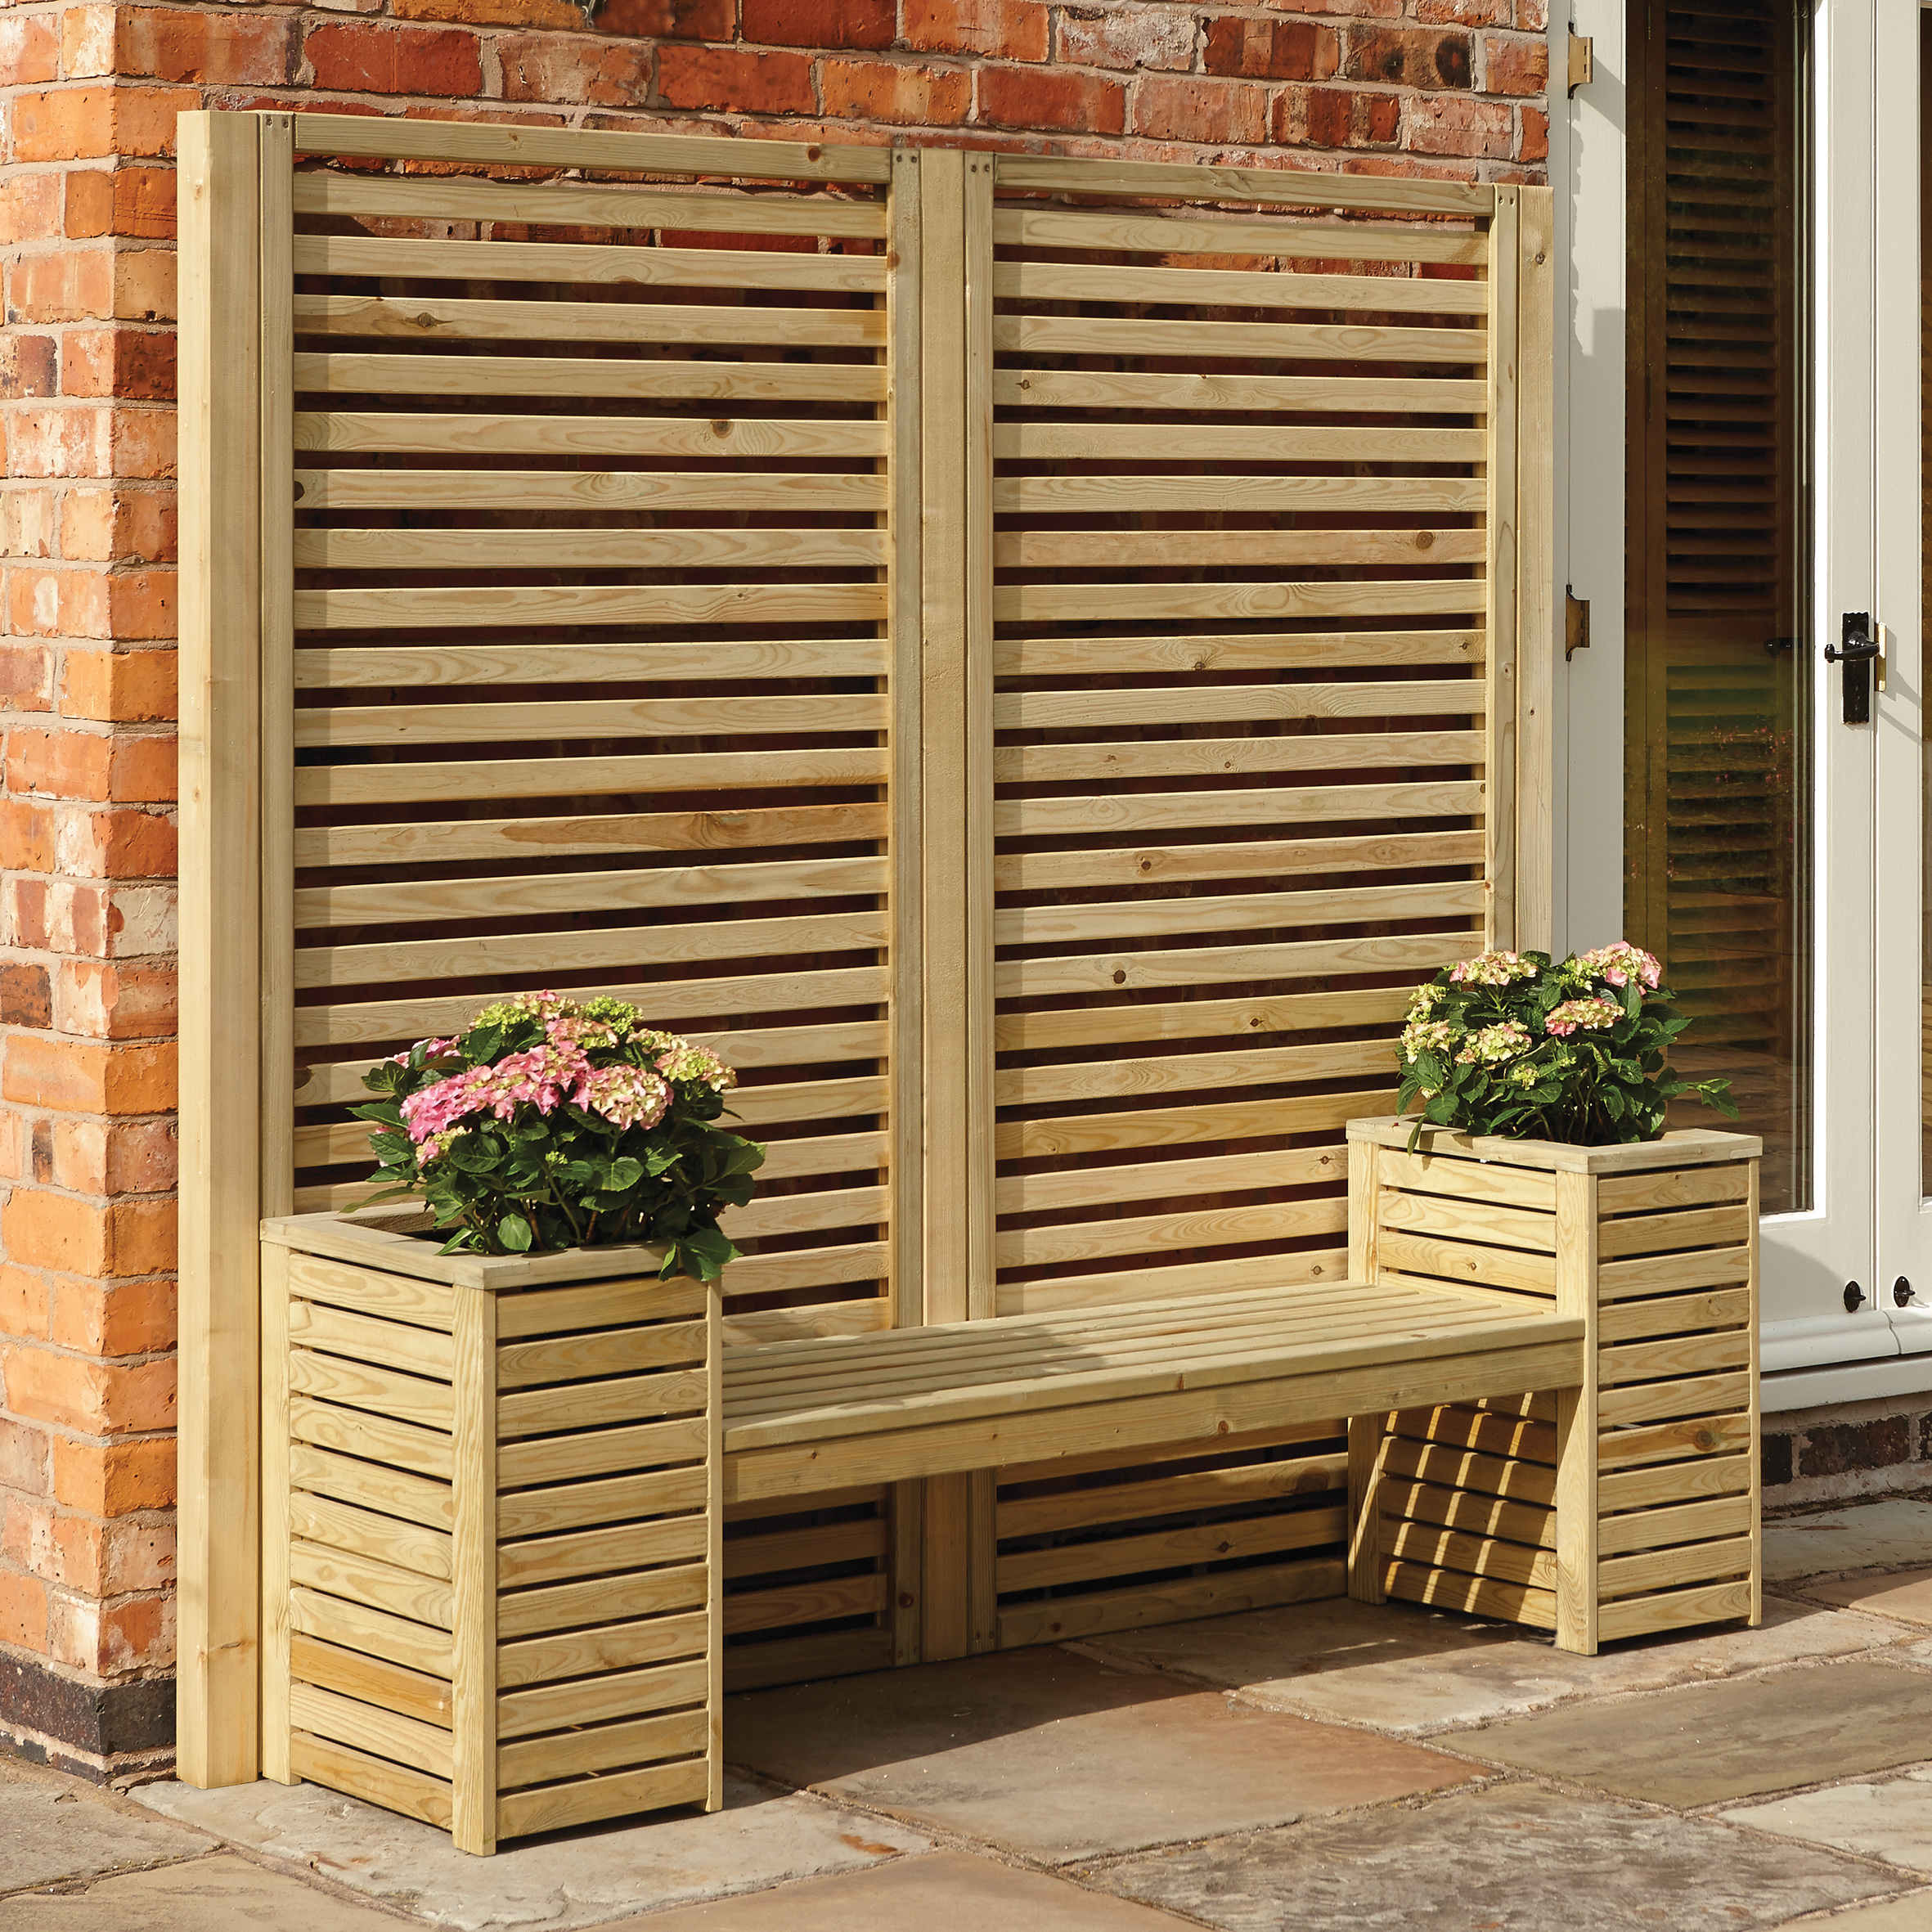 Wooden Seat & Planter Set